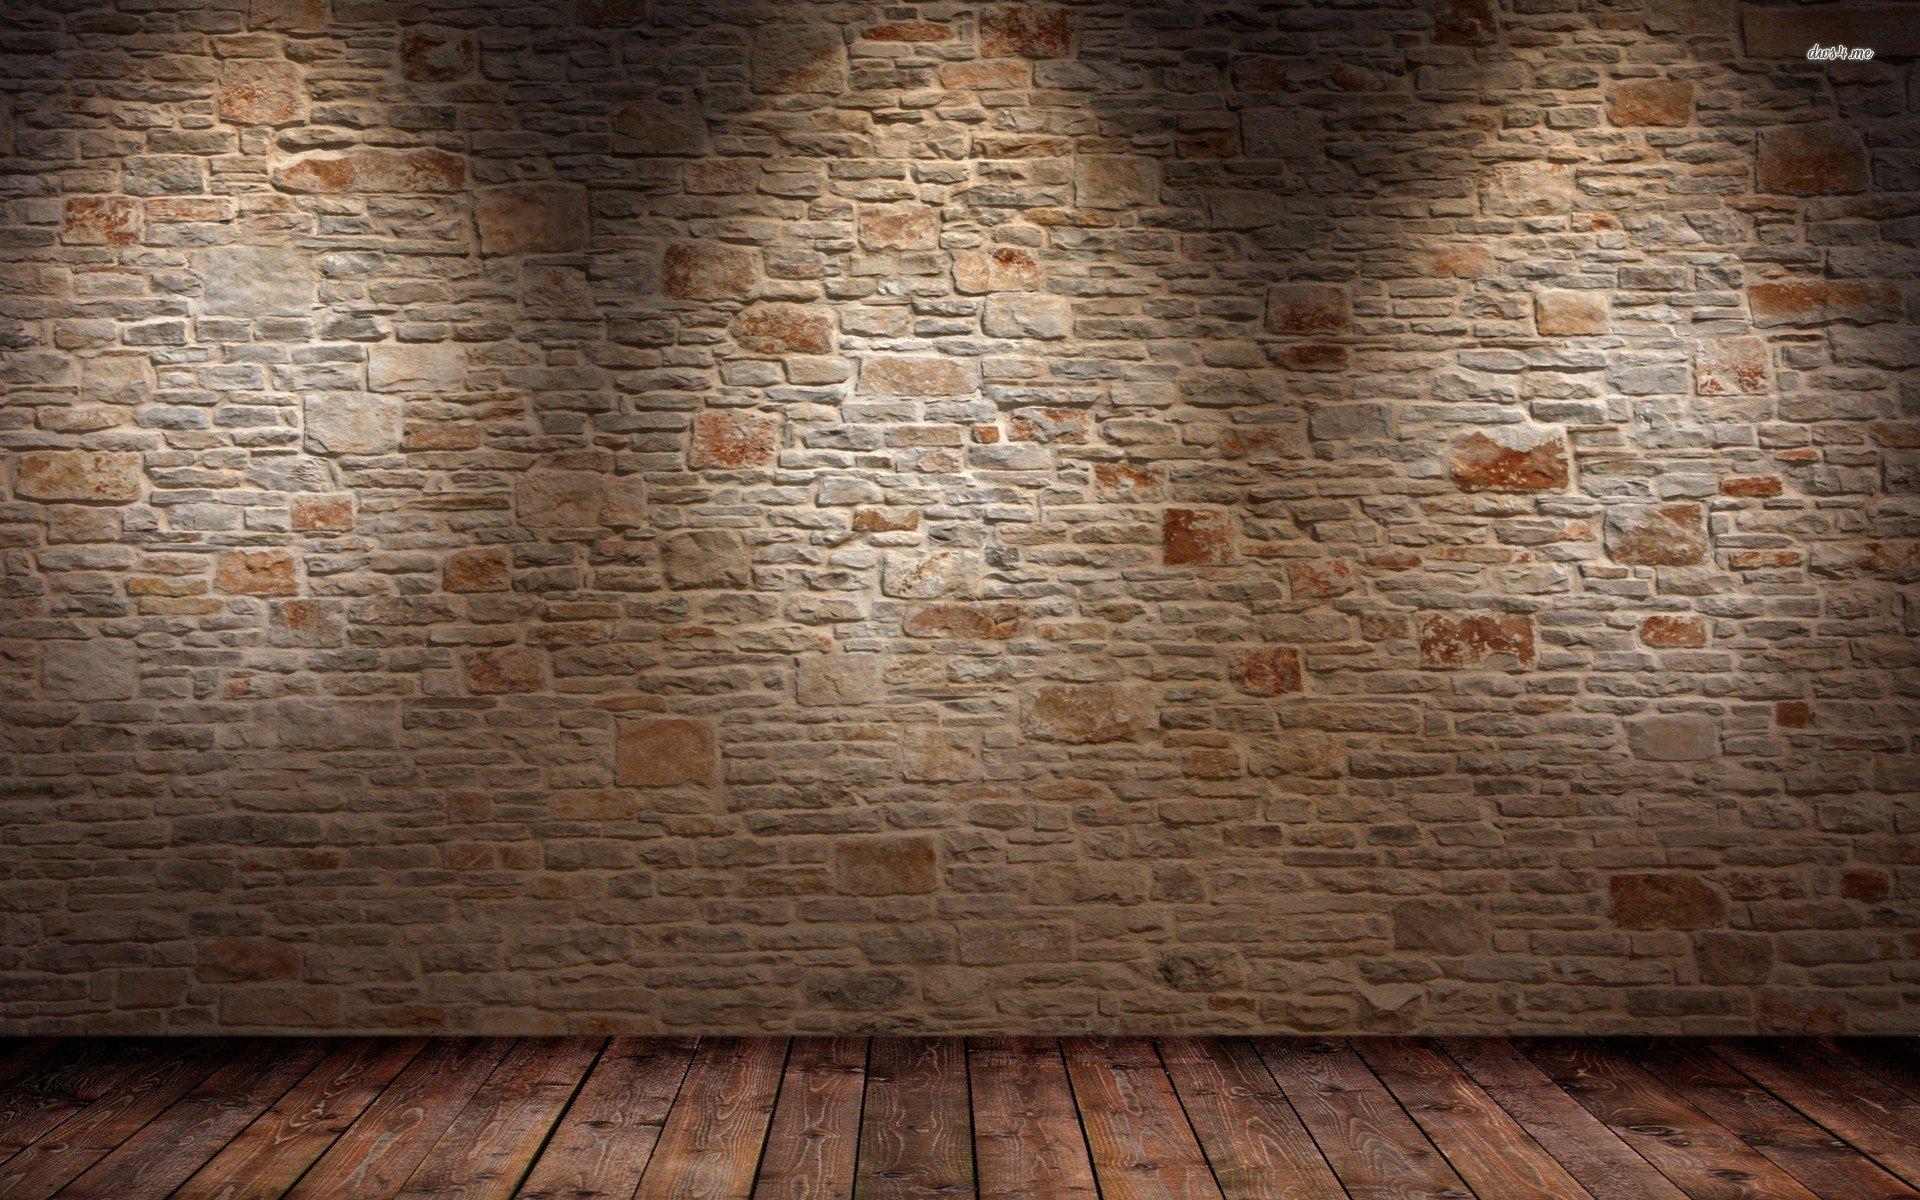 Brick Wall And Wood Floor 674076 - WallDevil